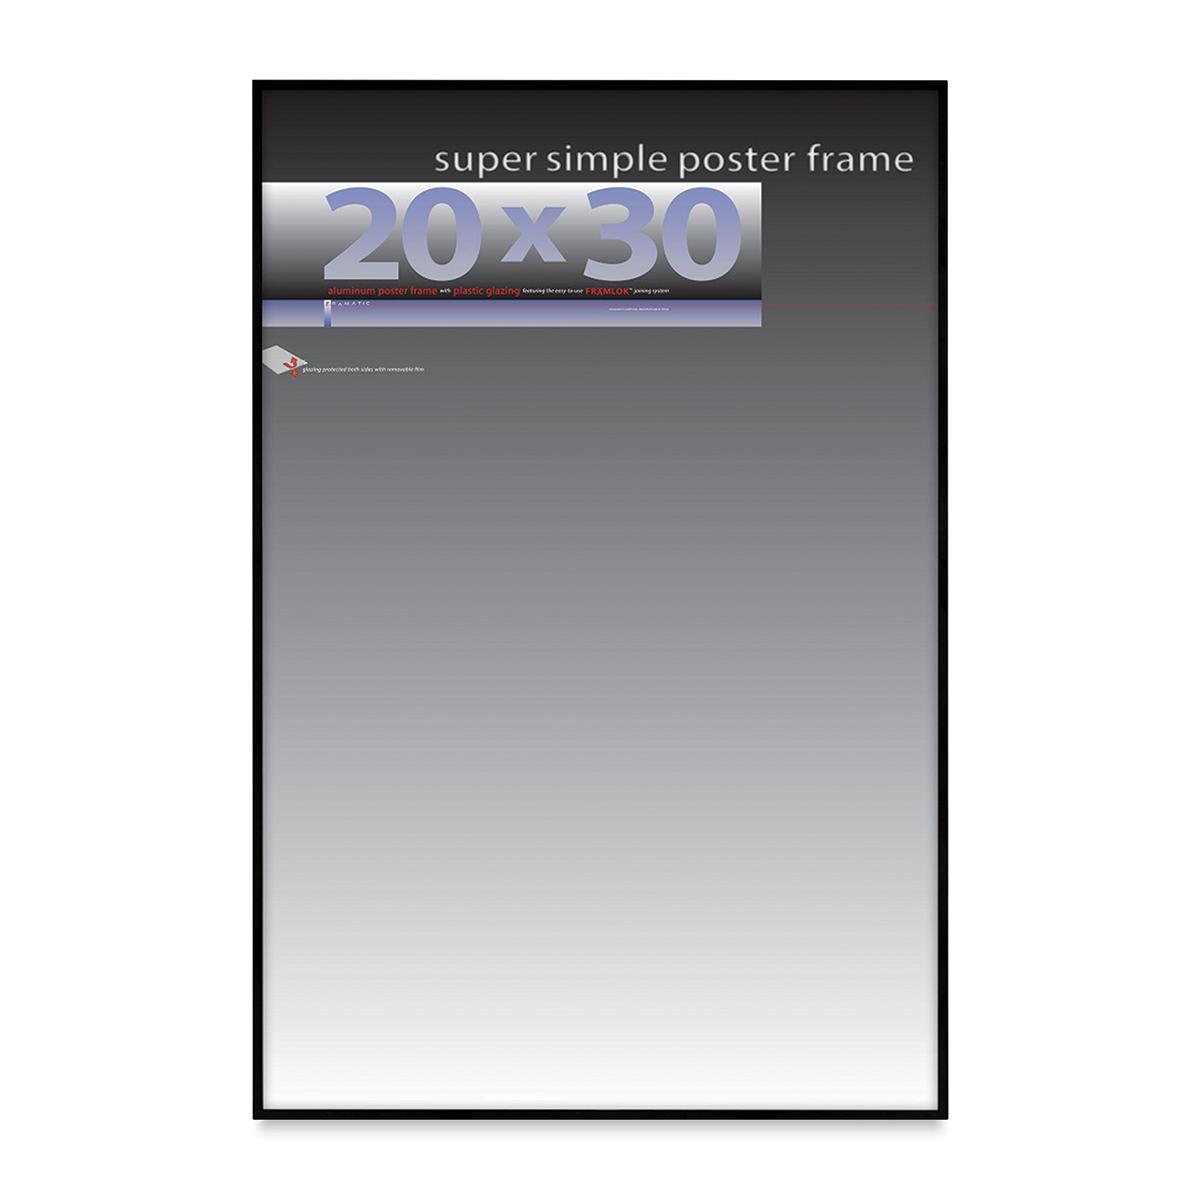 Framatic Super Simple Poster Frame - Black, 20 x 30